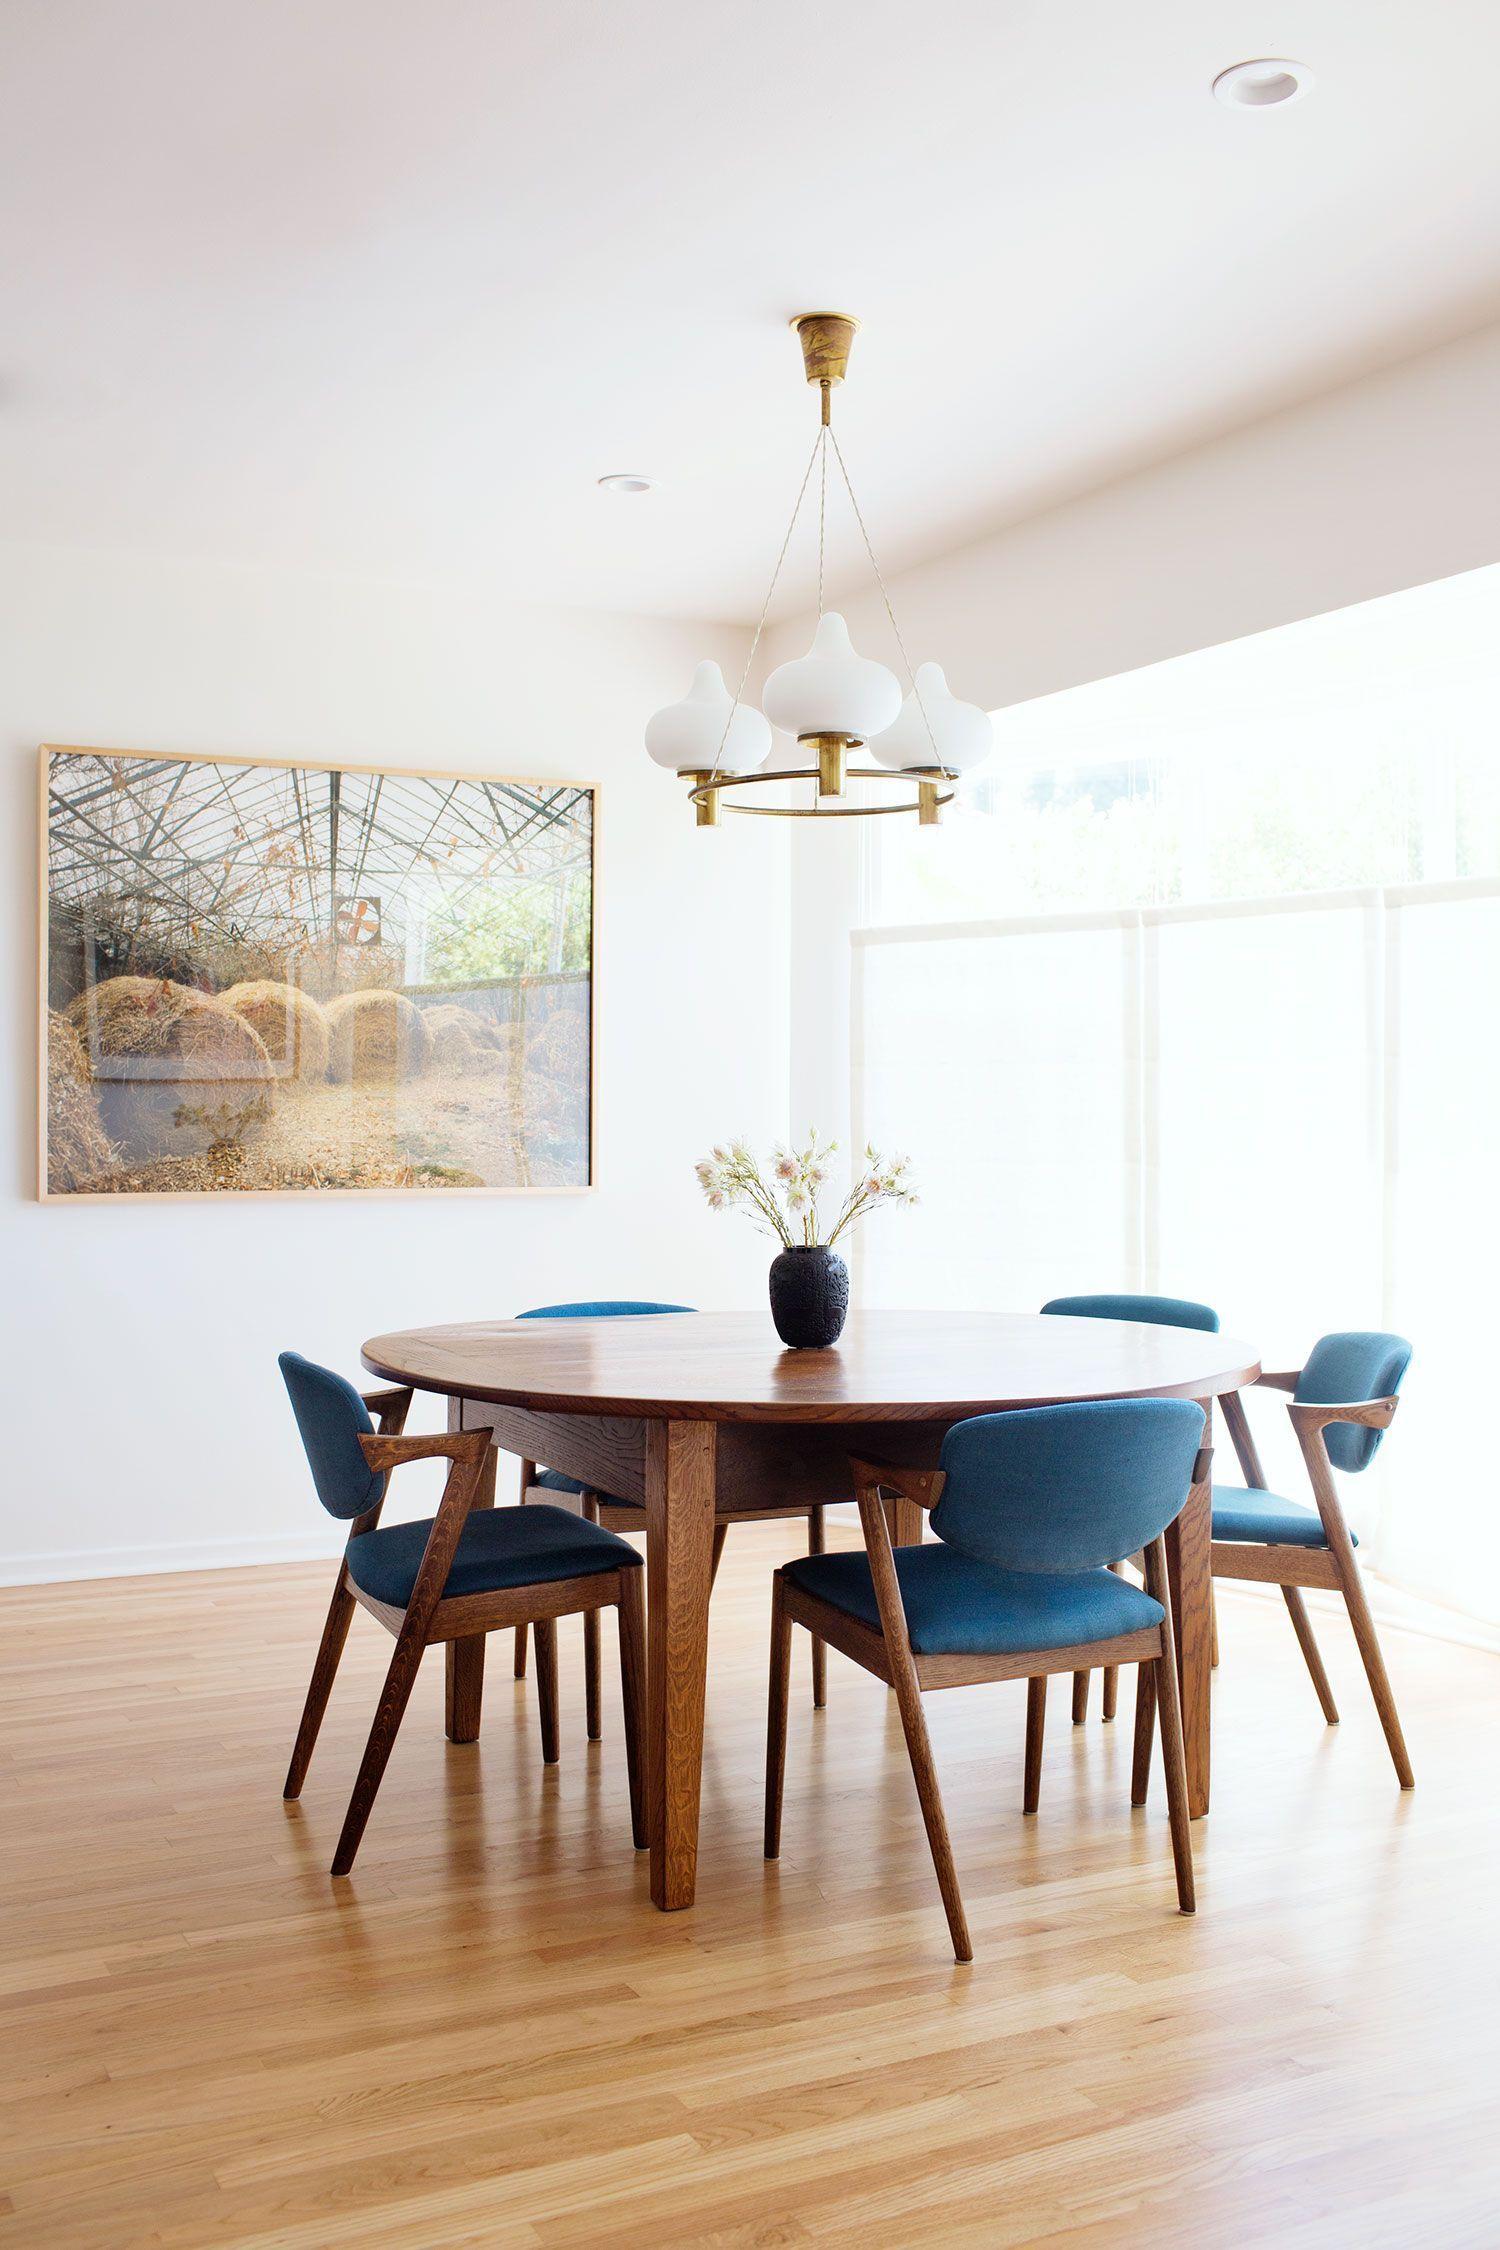 Minimalist Mid Century Modern Inspired Dining Room Decor With Blue